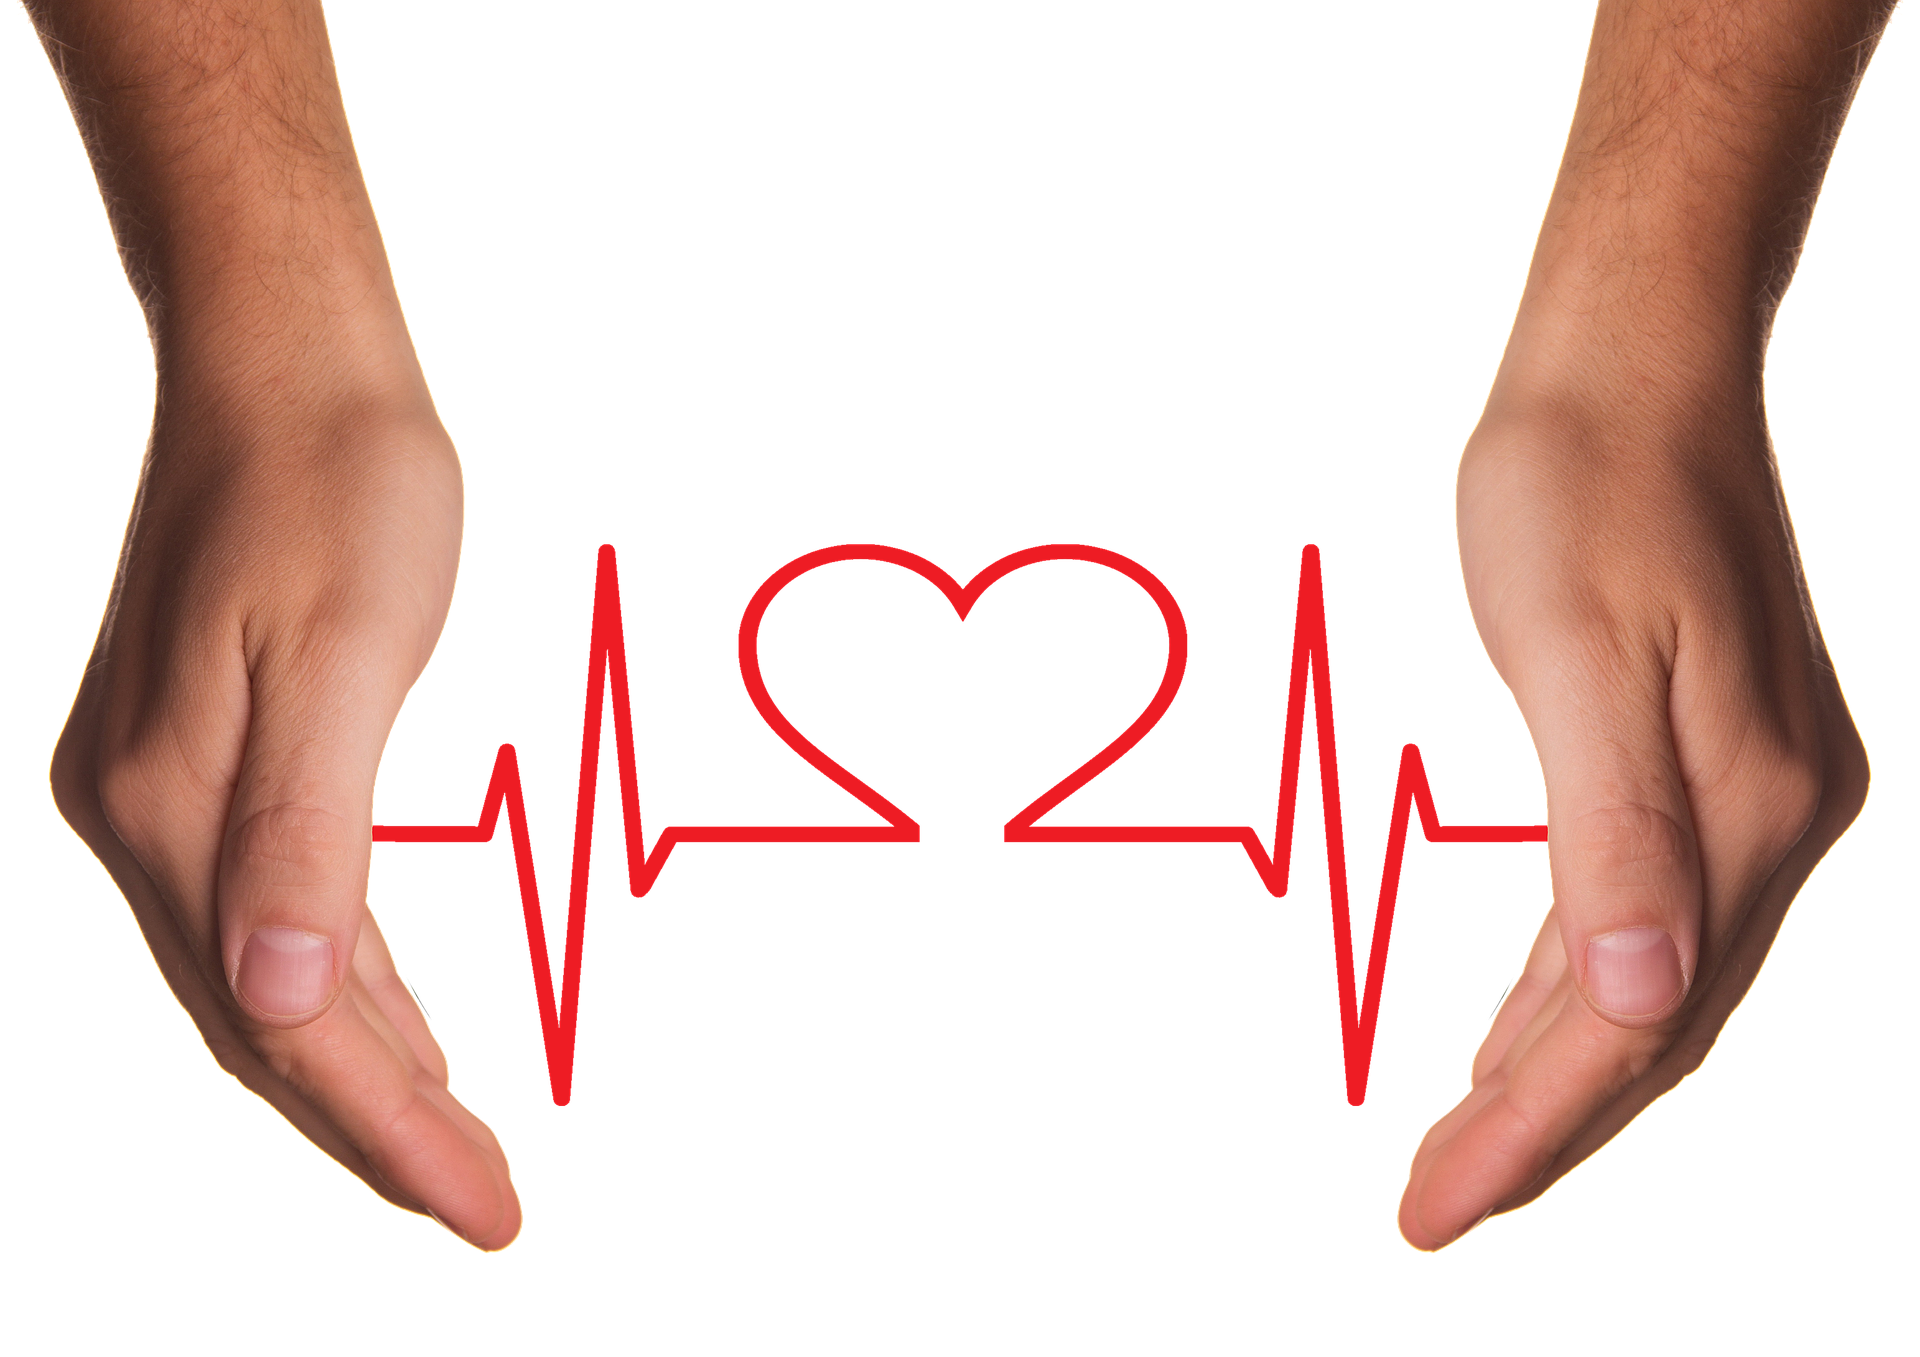 heart-care-1040229_1920